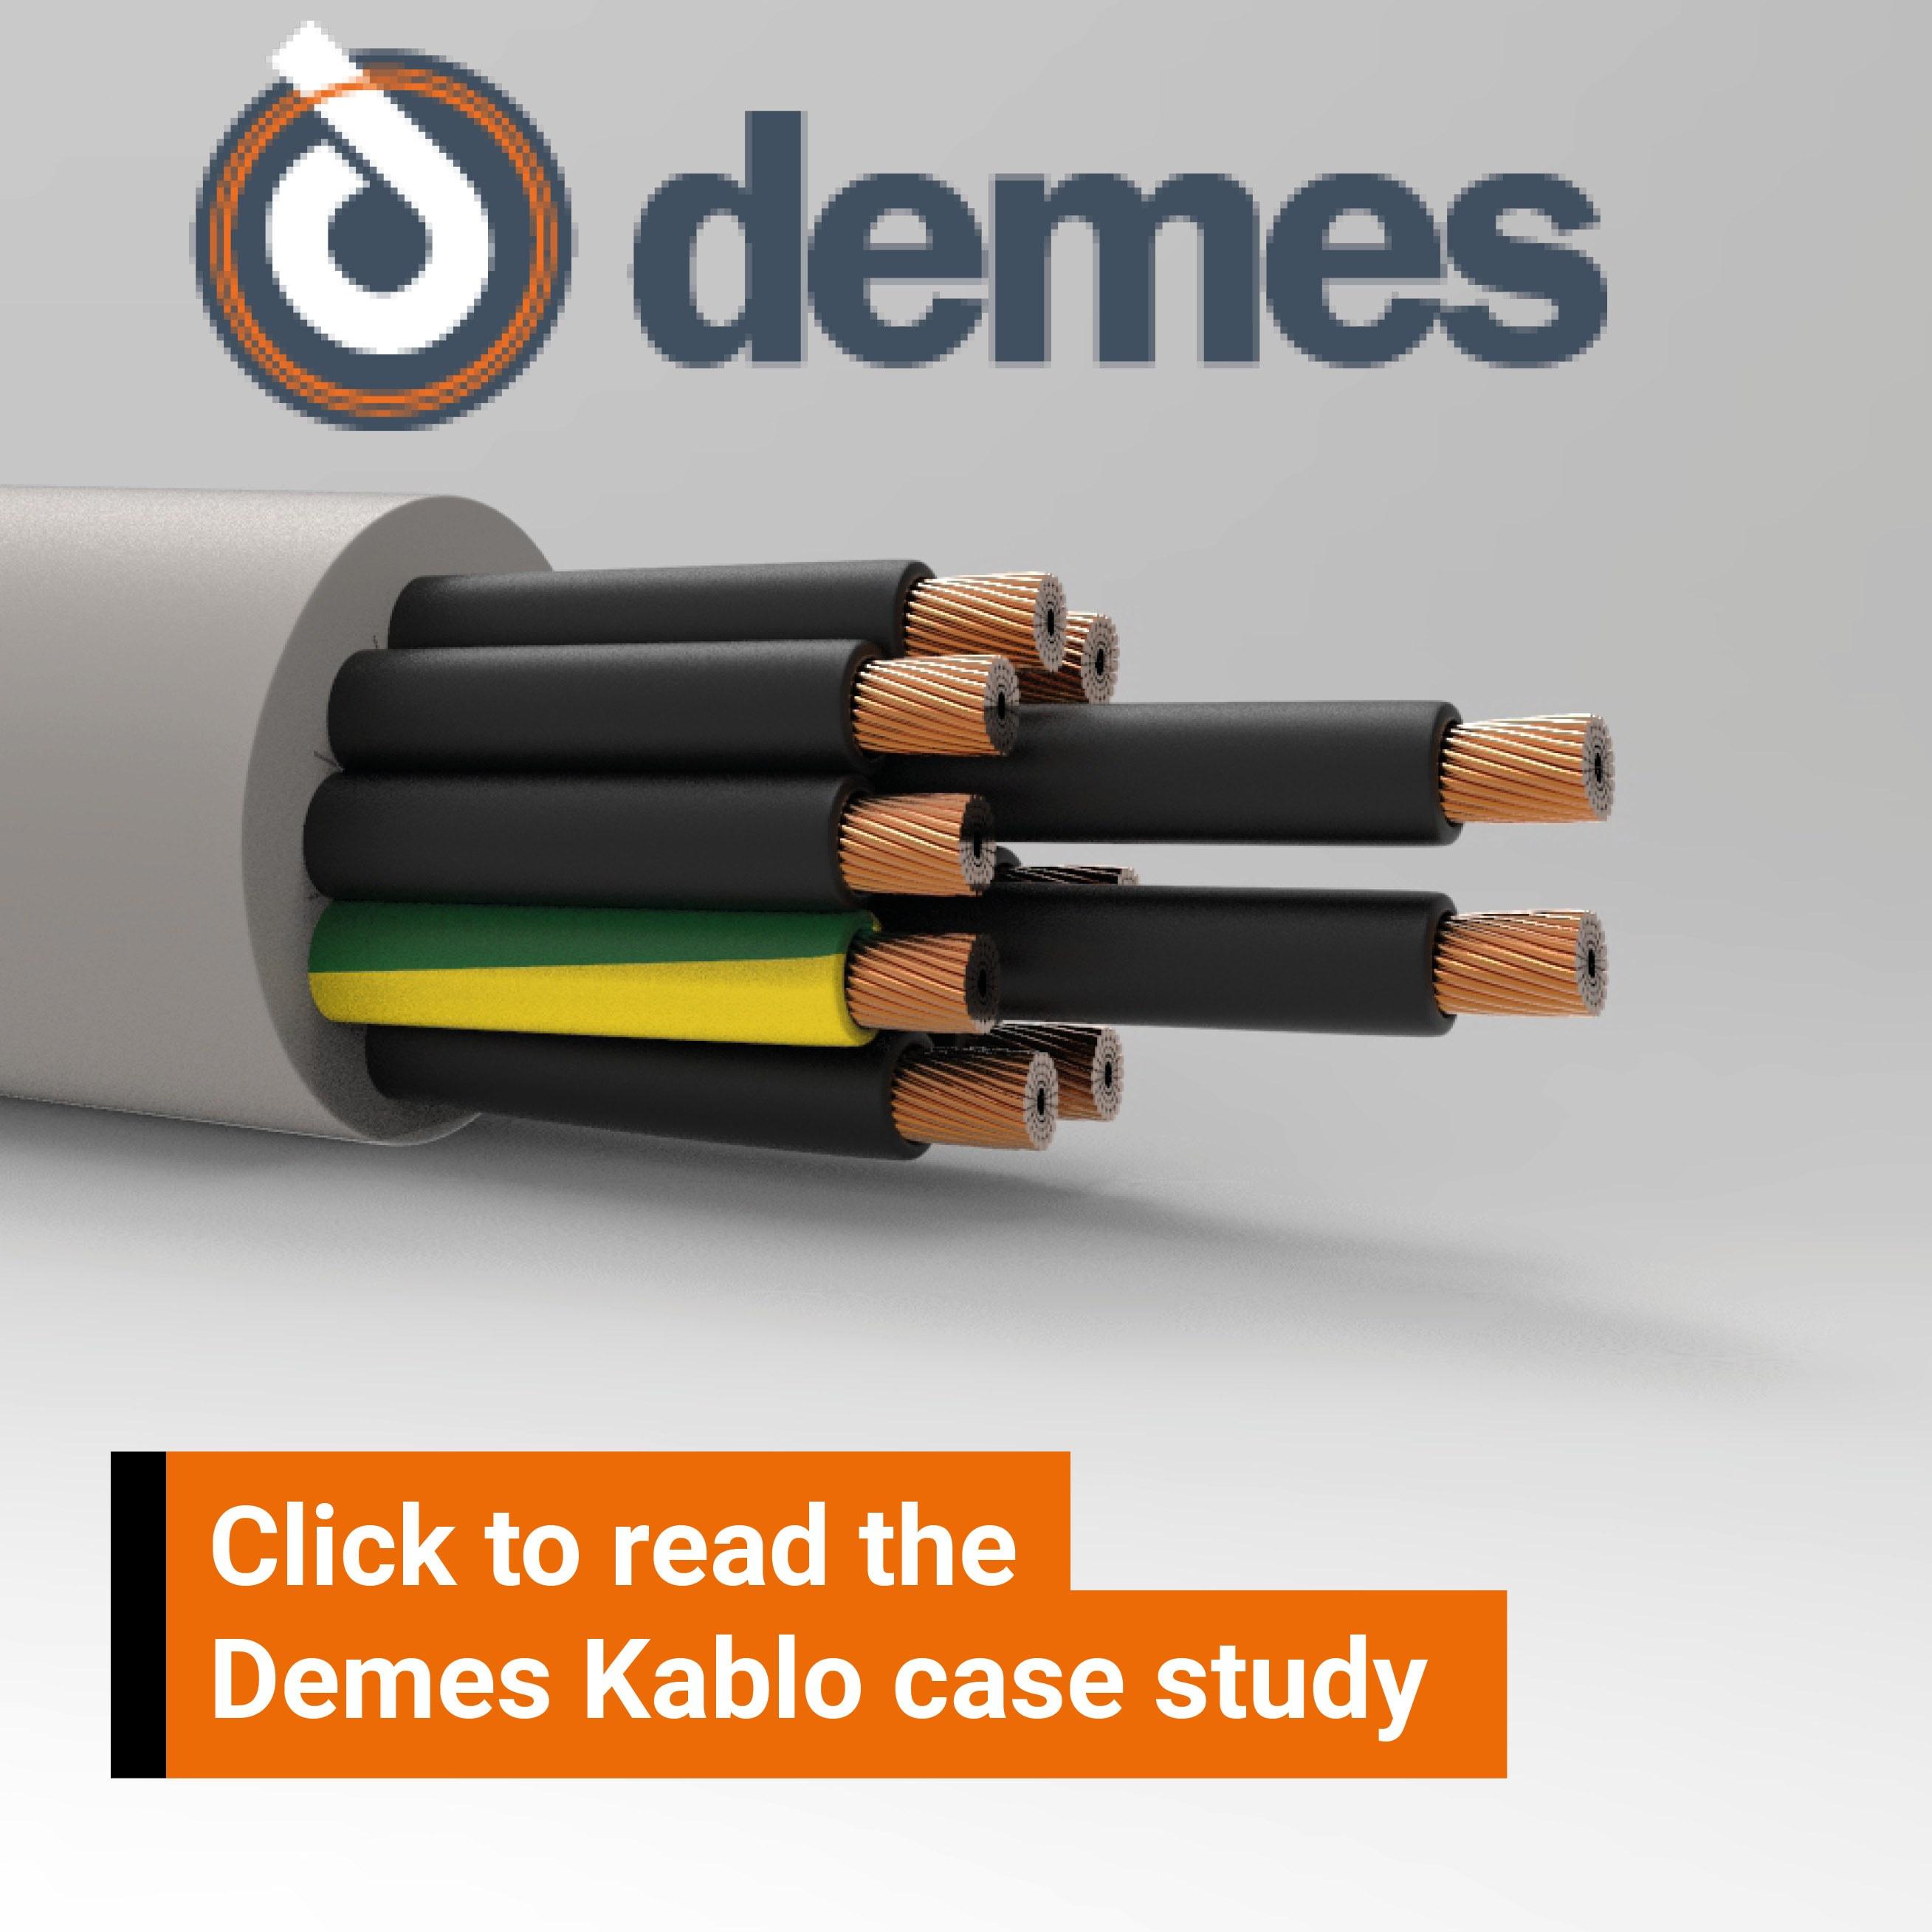 Demes-Kablo-case-study-web-page-imageV3